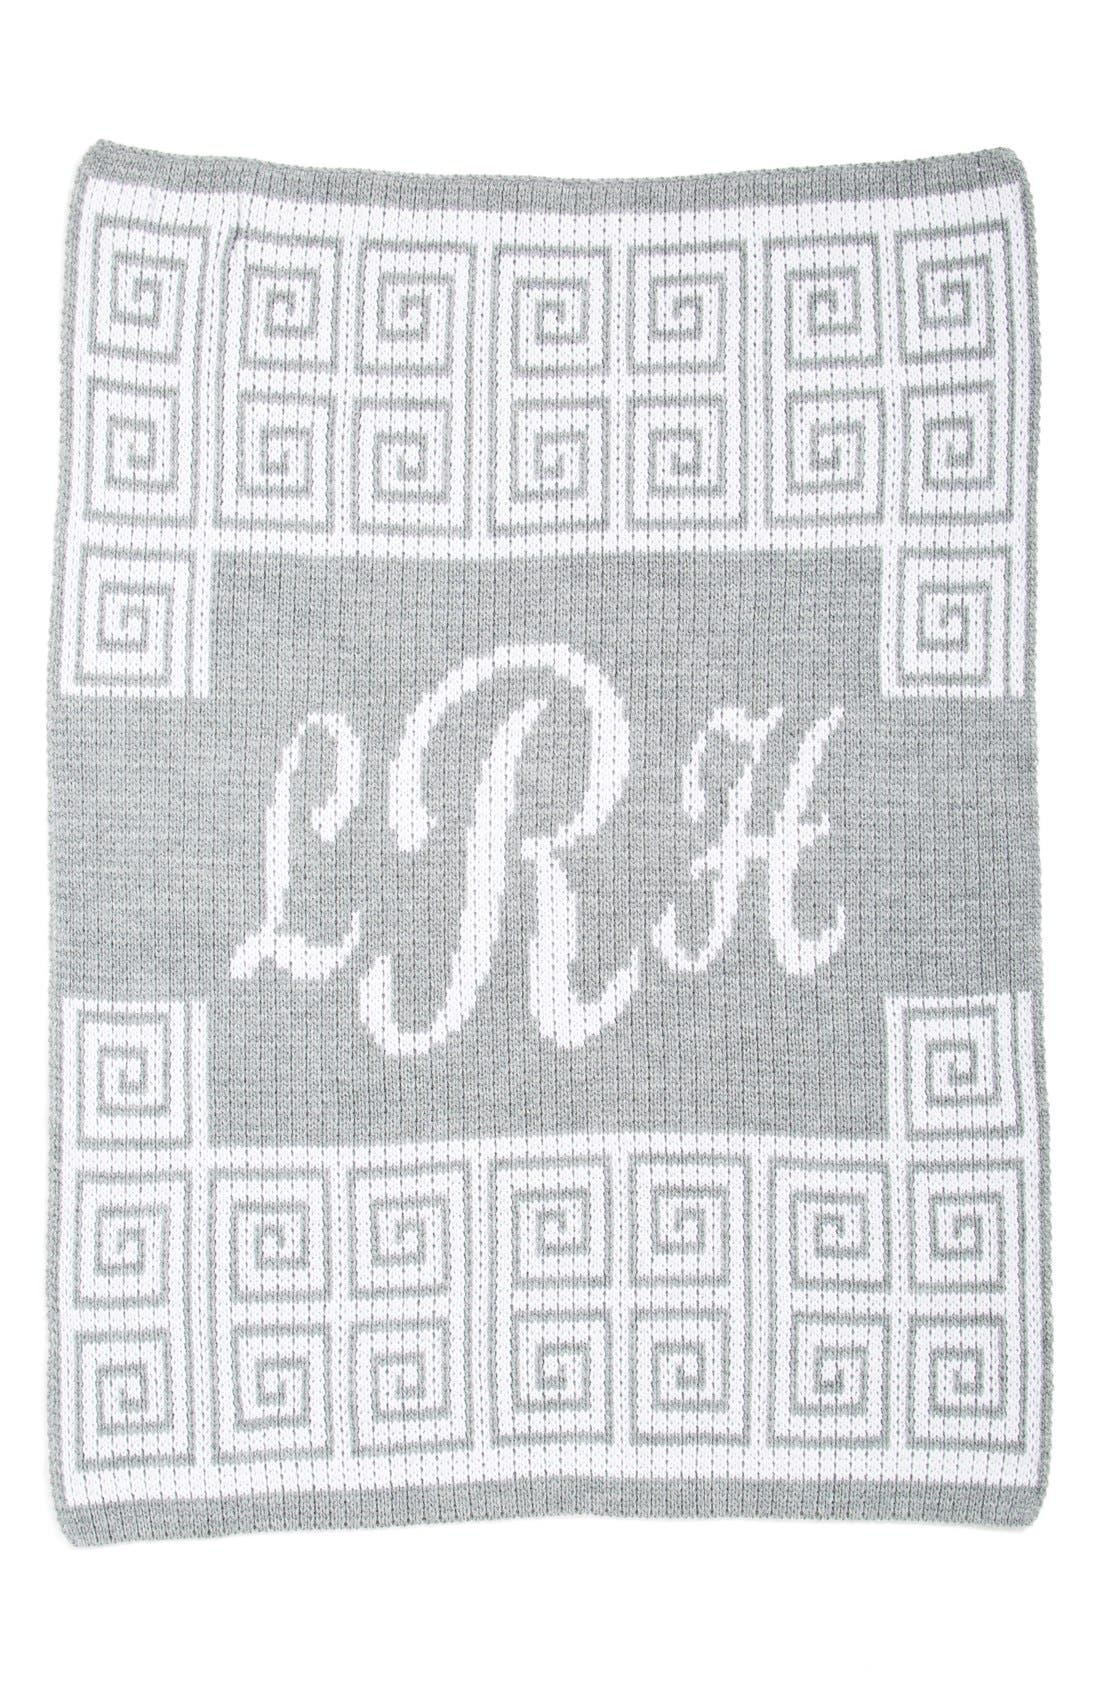 Butterscotch Blankees'Script' Personalized Blanket